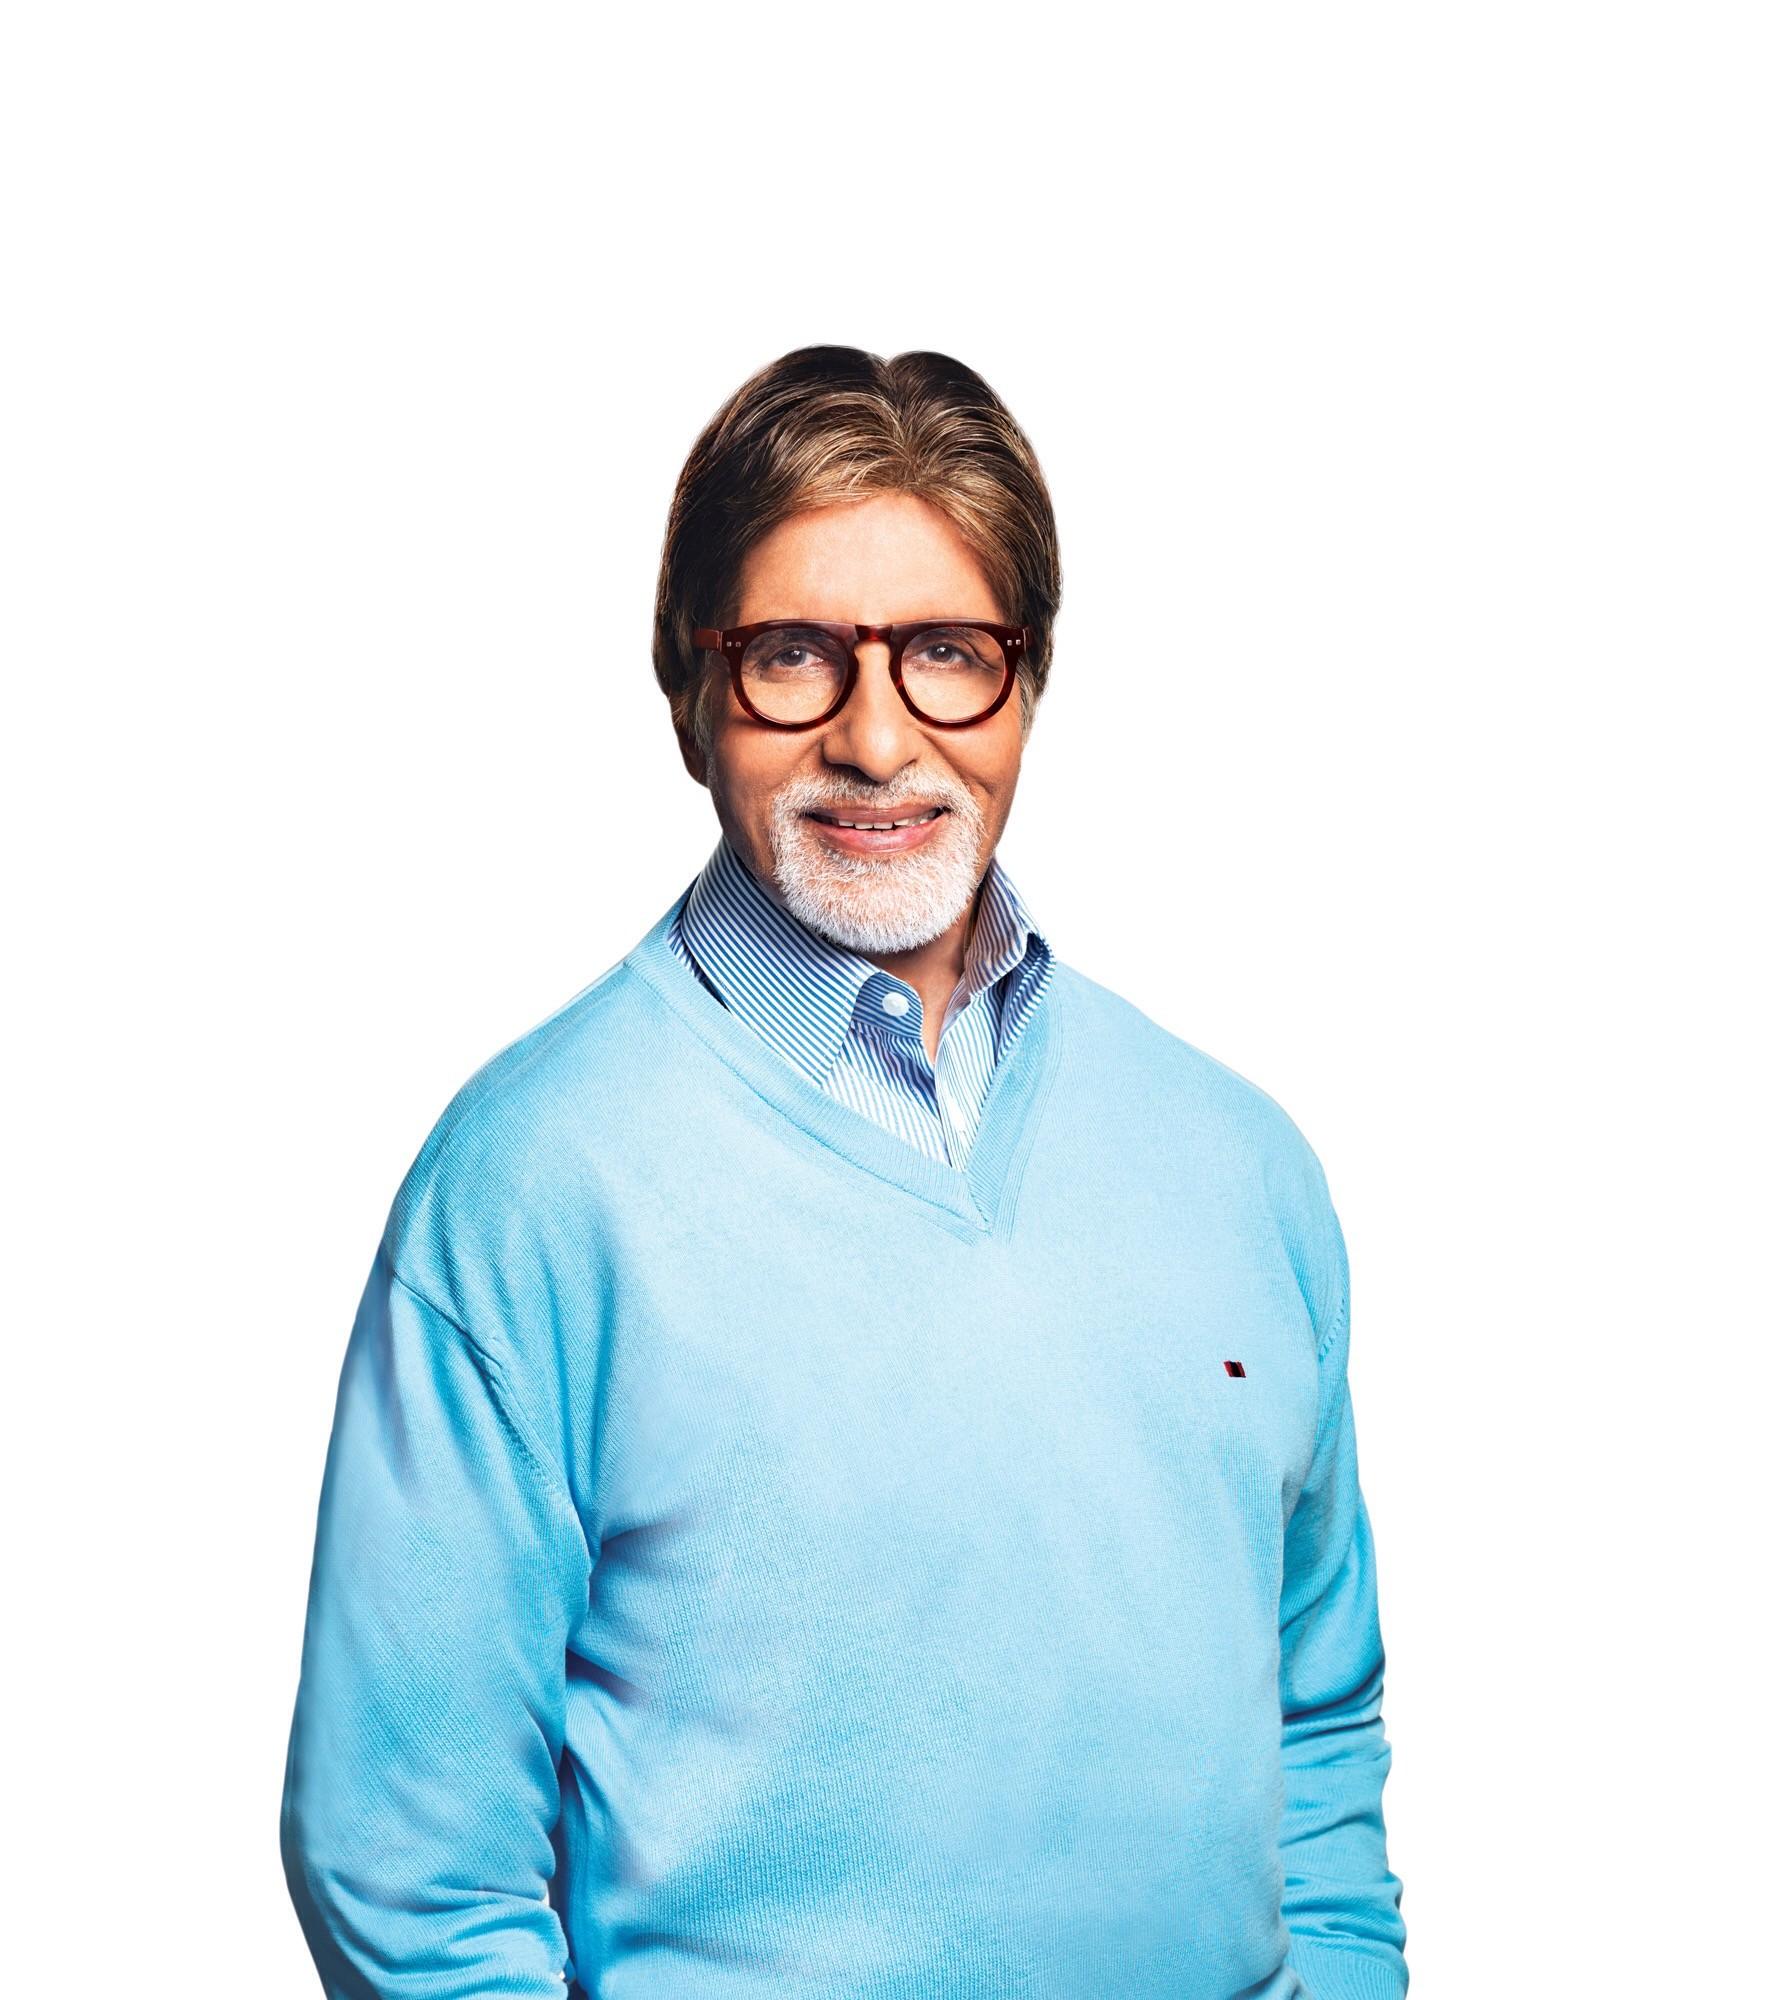 Amitabh Bachchan's Portrait photo.